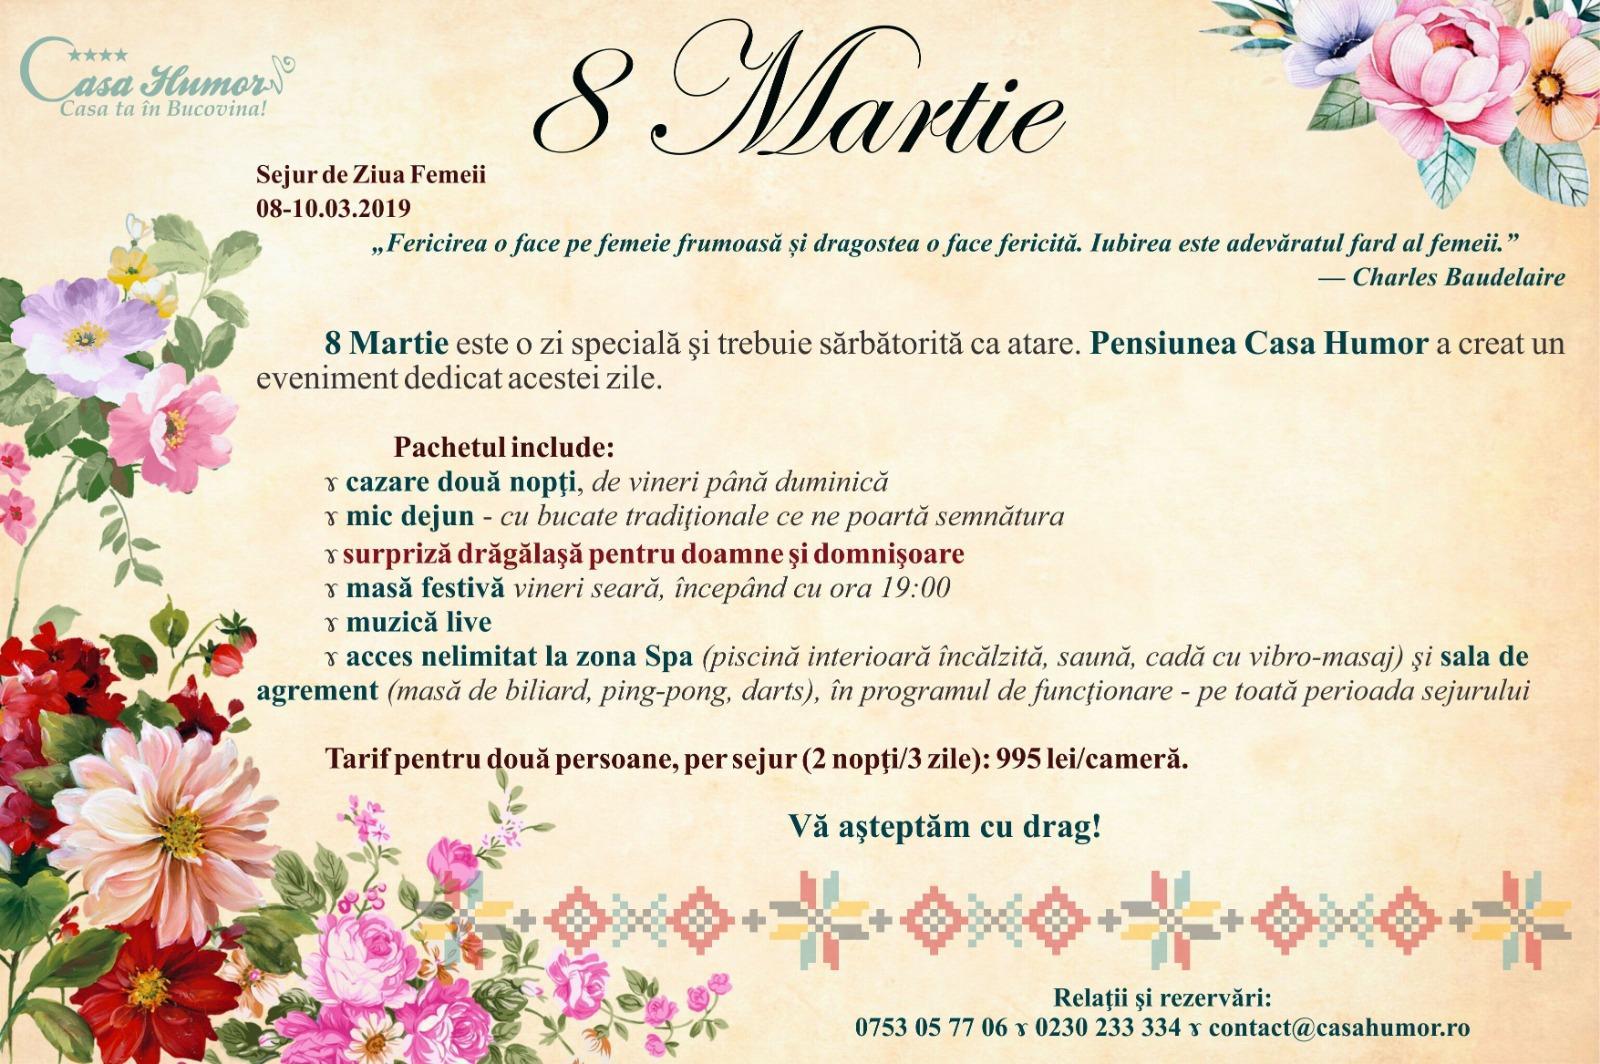 oferta 8 marttie